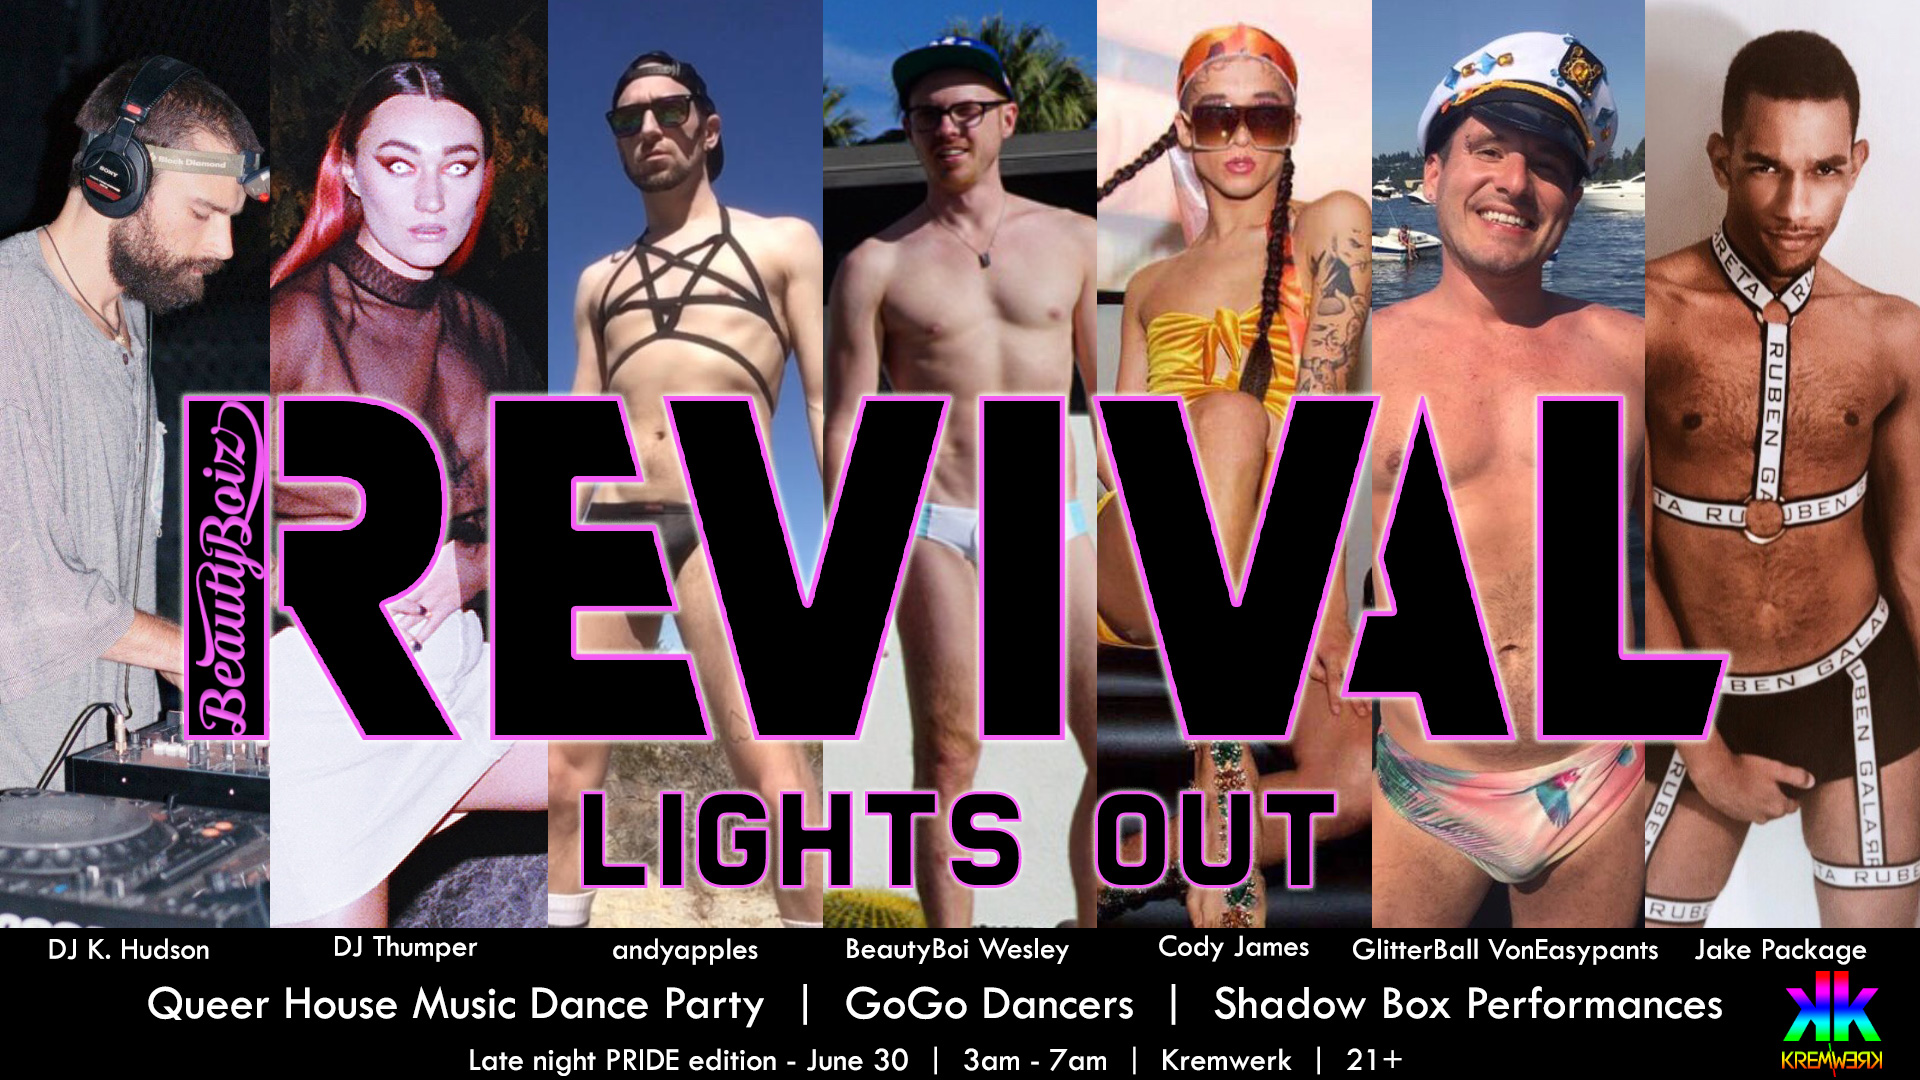 FB-Revival-lightsout_cast.jpg